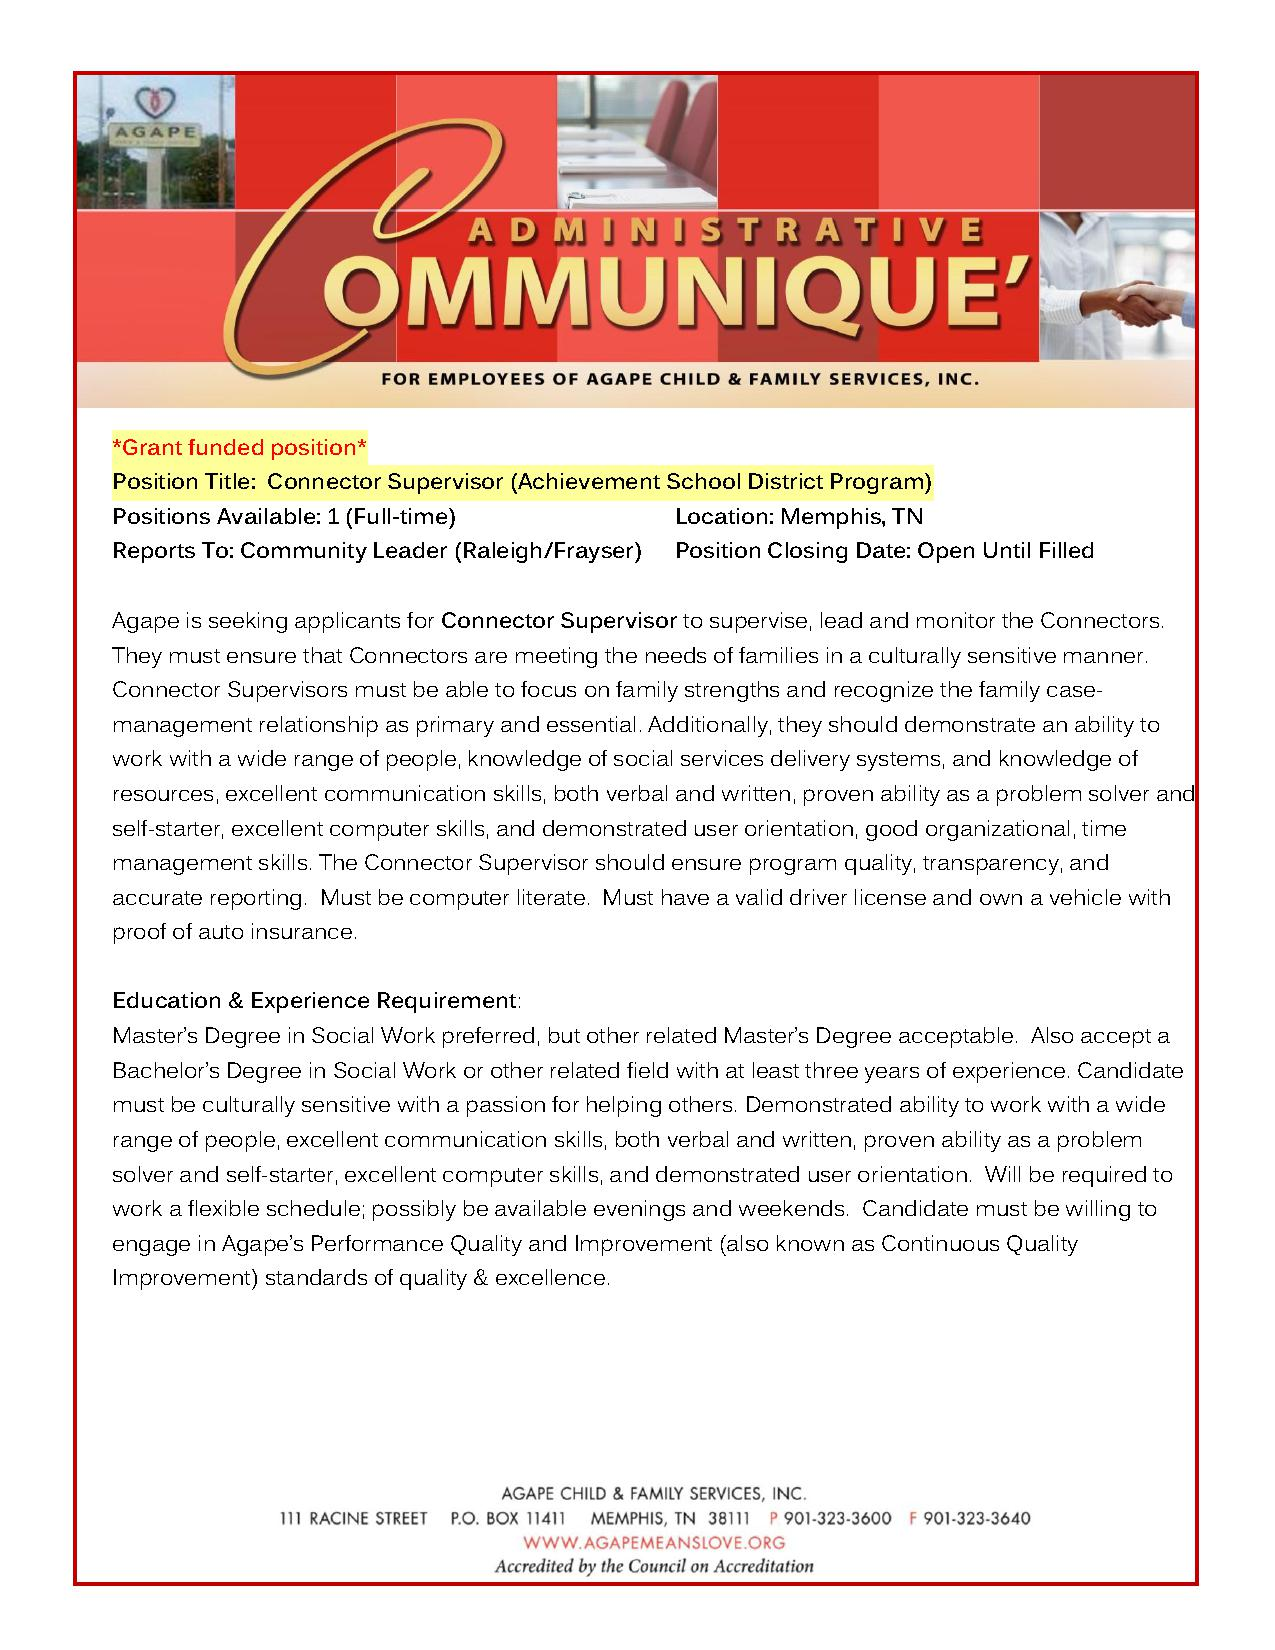 december 2013 job u0026 career news from the memphis public libraries